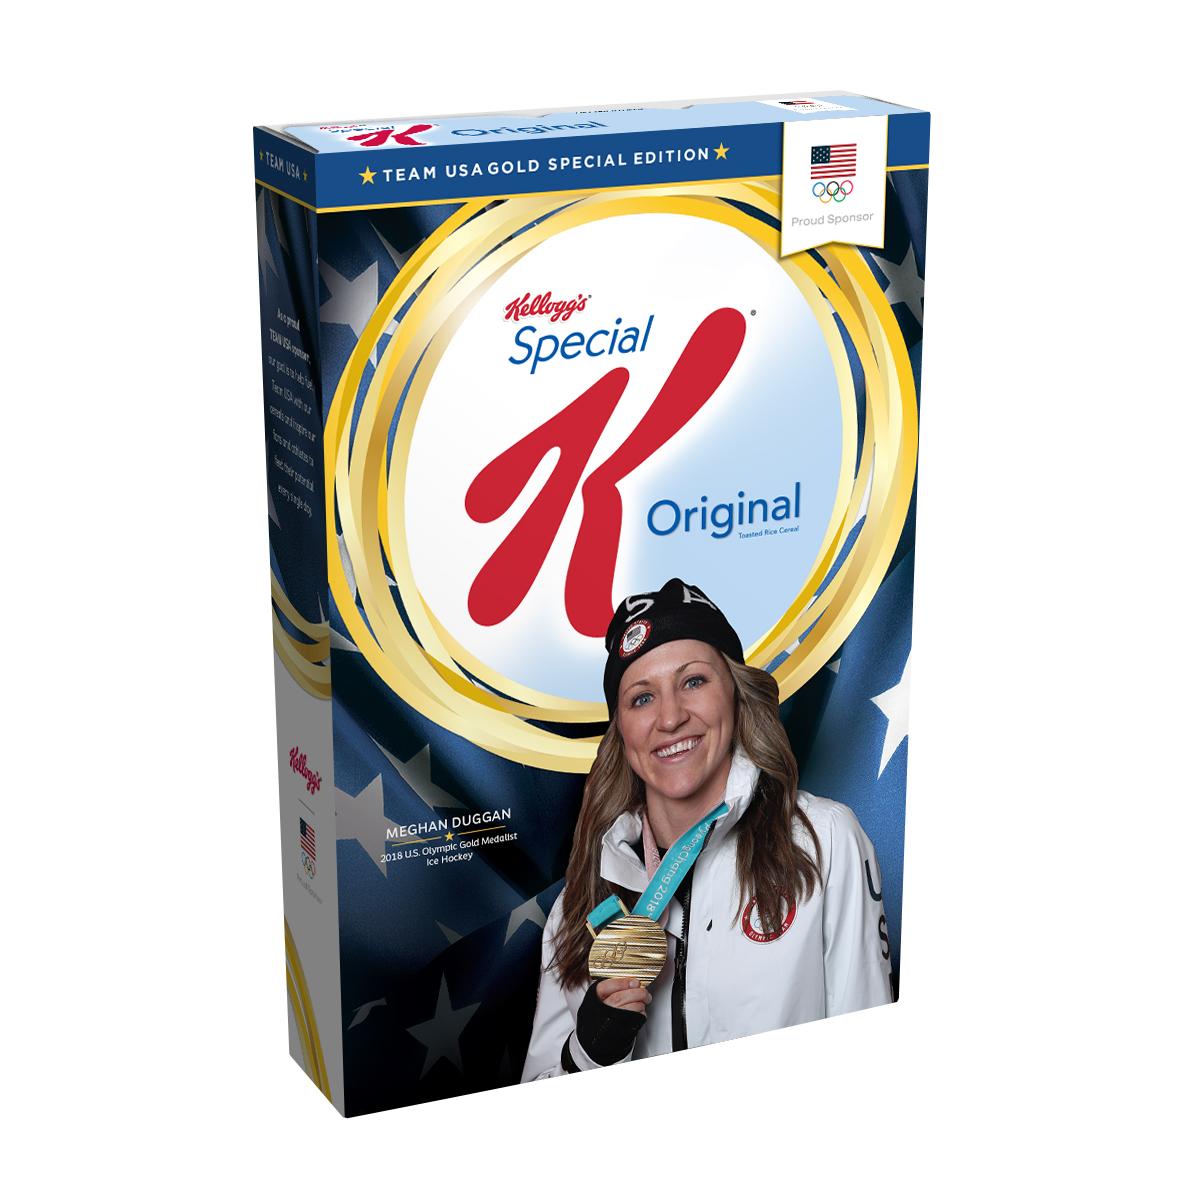 Meghan Duggan's Gold Medal Edition Kellogg's® Special K® Box